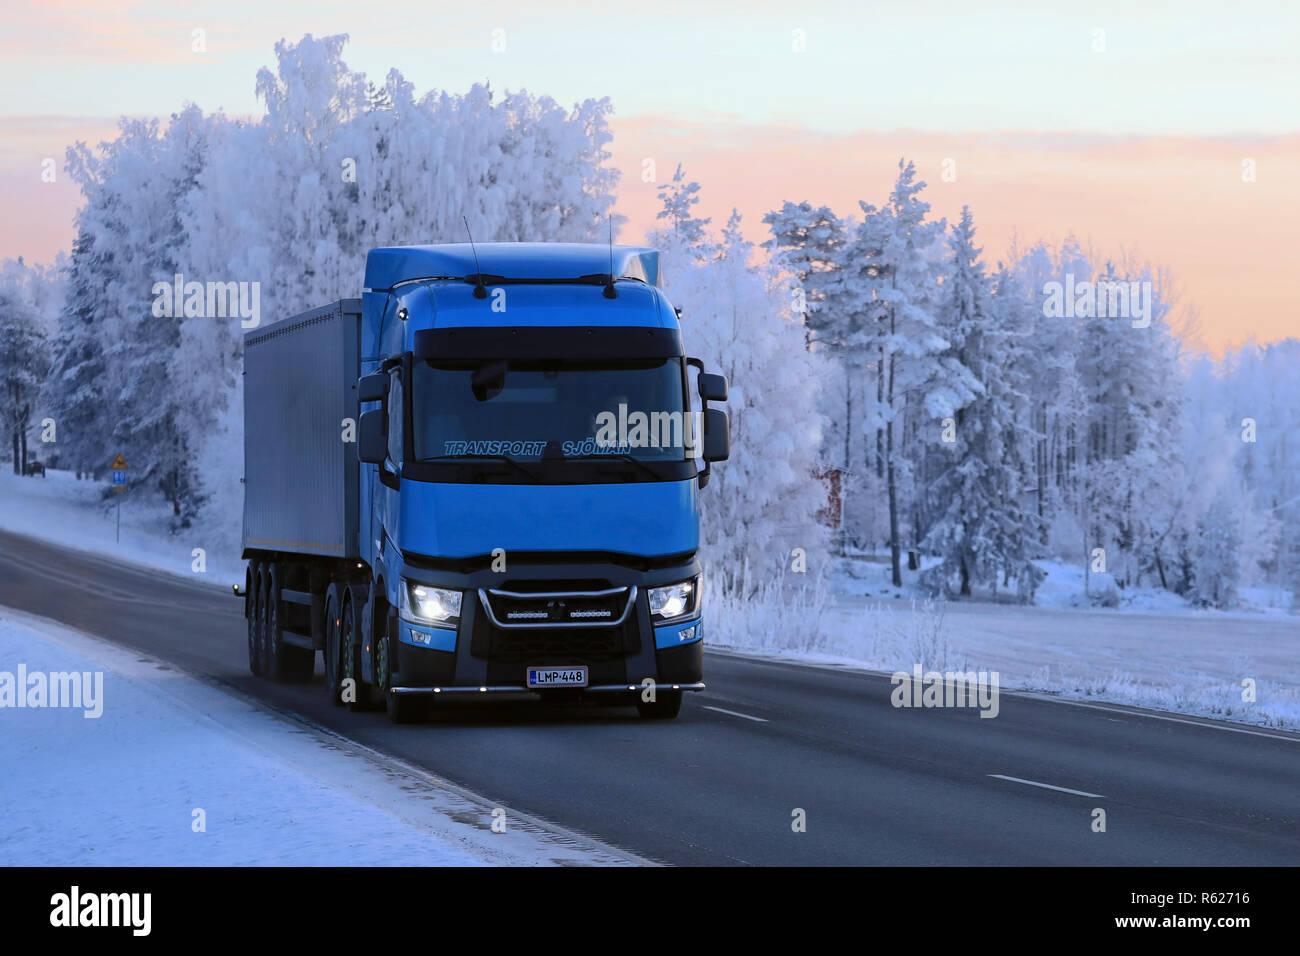 Salo, Finland - January 19, 2018: Blue Renault Trucks T semi of